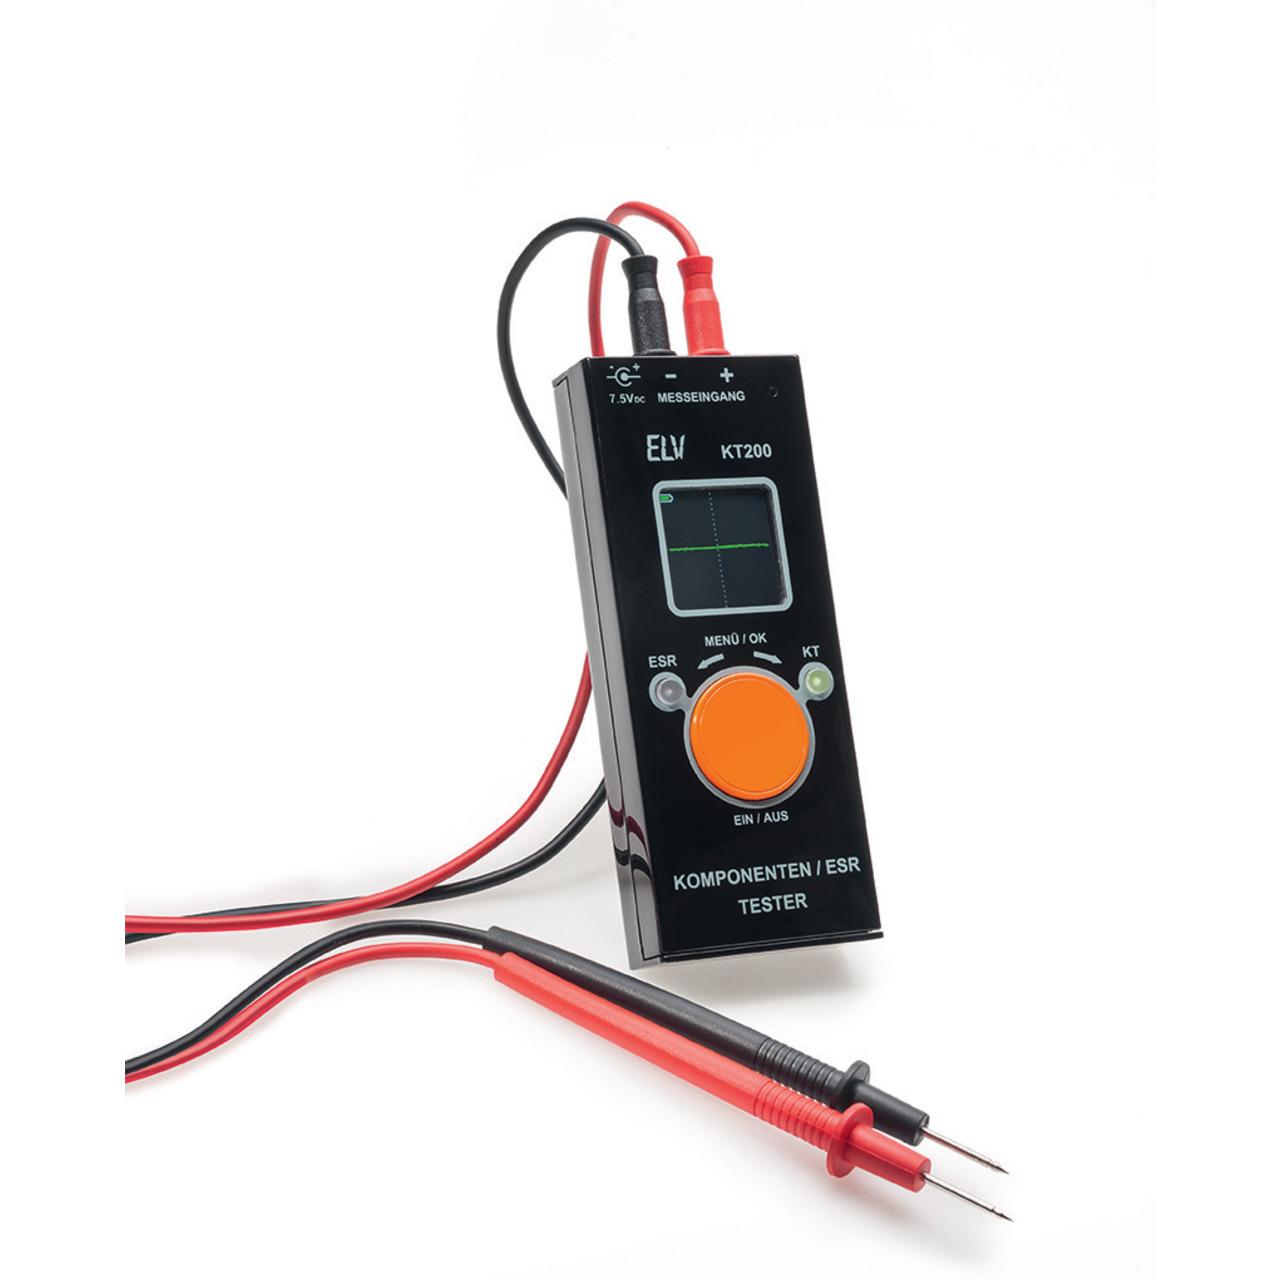 ELV Komplettbausatz Komponententester-ESR-Meter mit OLED-Display KT200